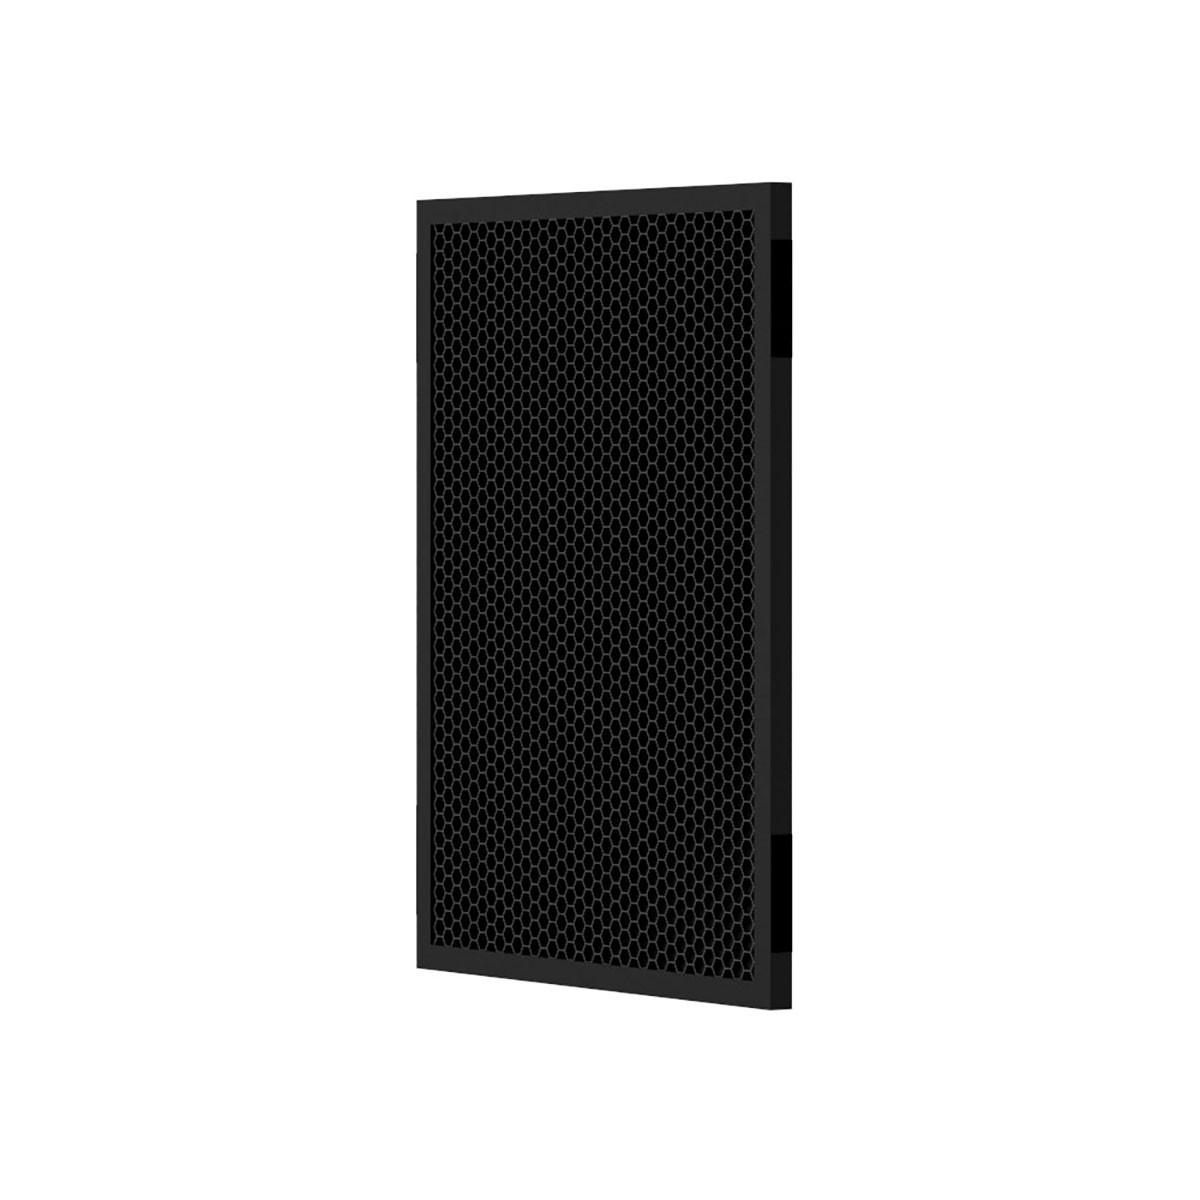 Colmeia para softbox spot 40 x 55